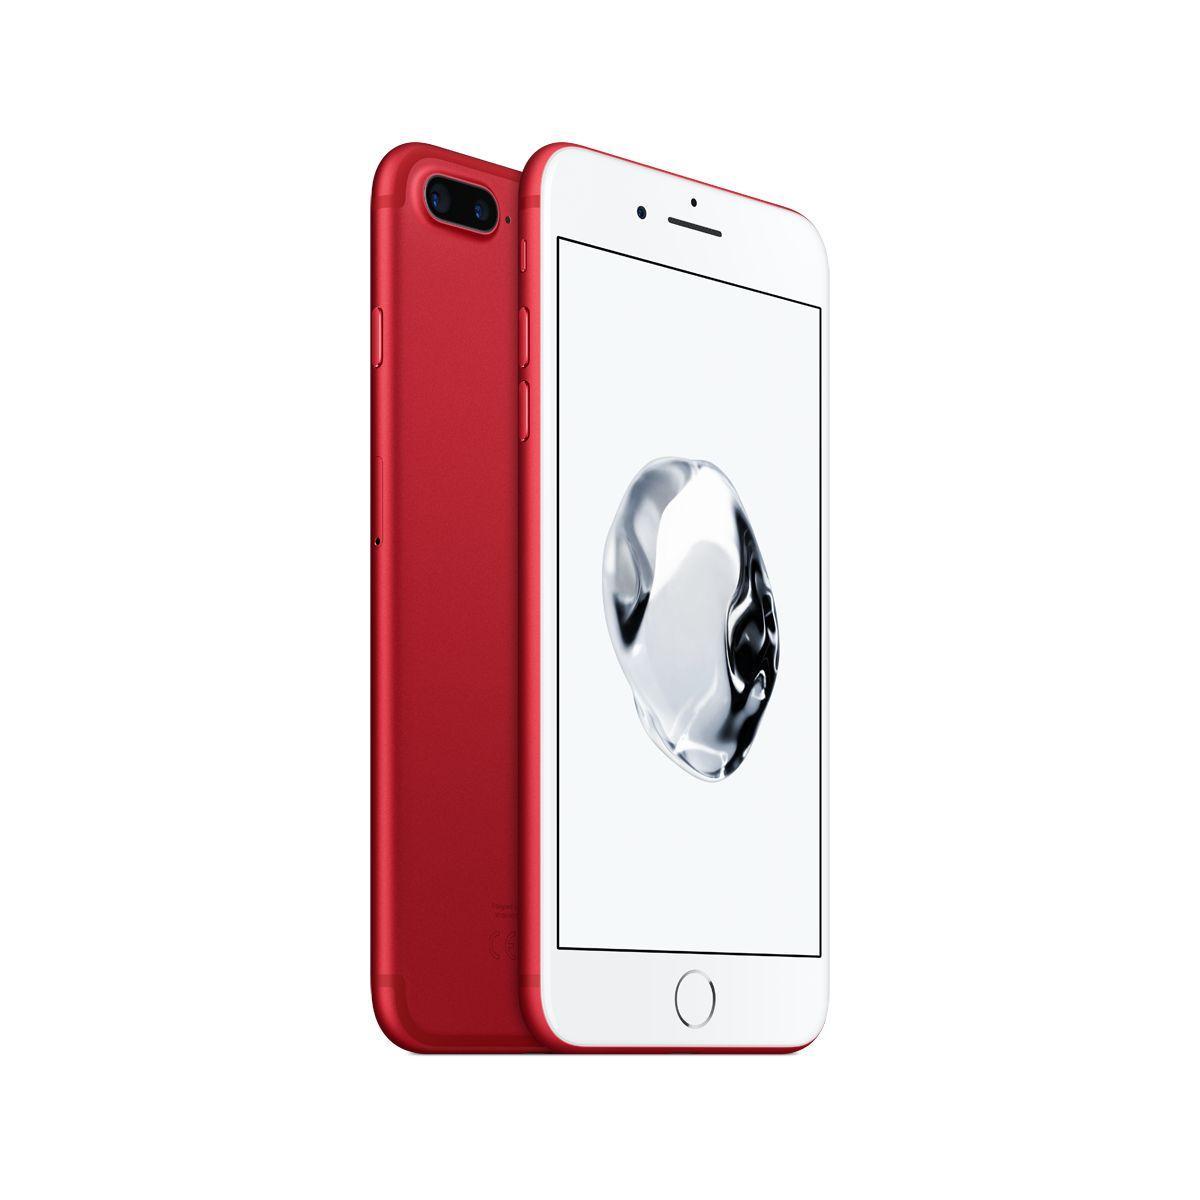 Apple iphone 7 128go rouge (photo)